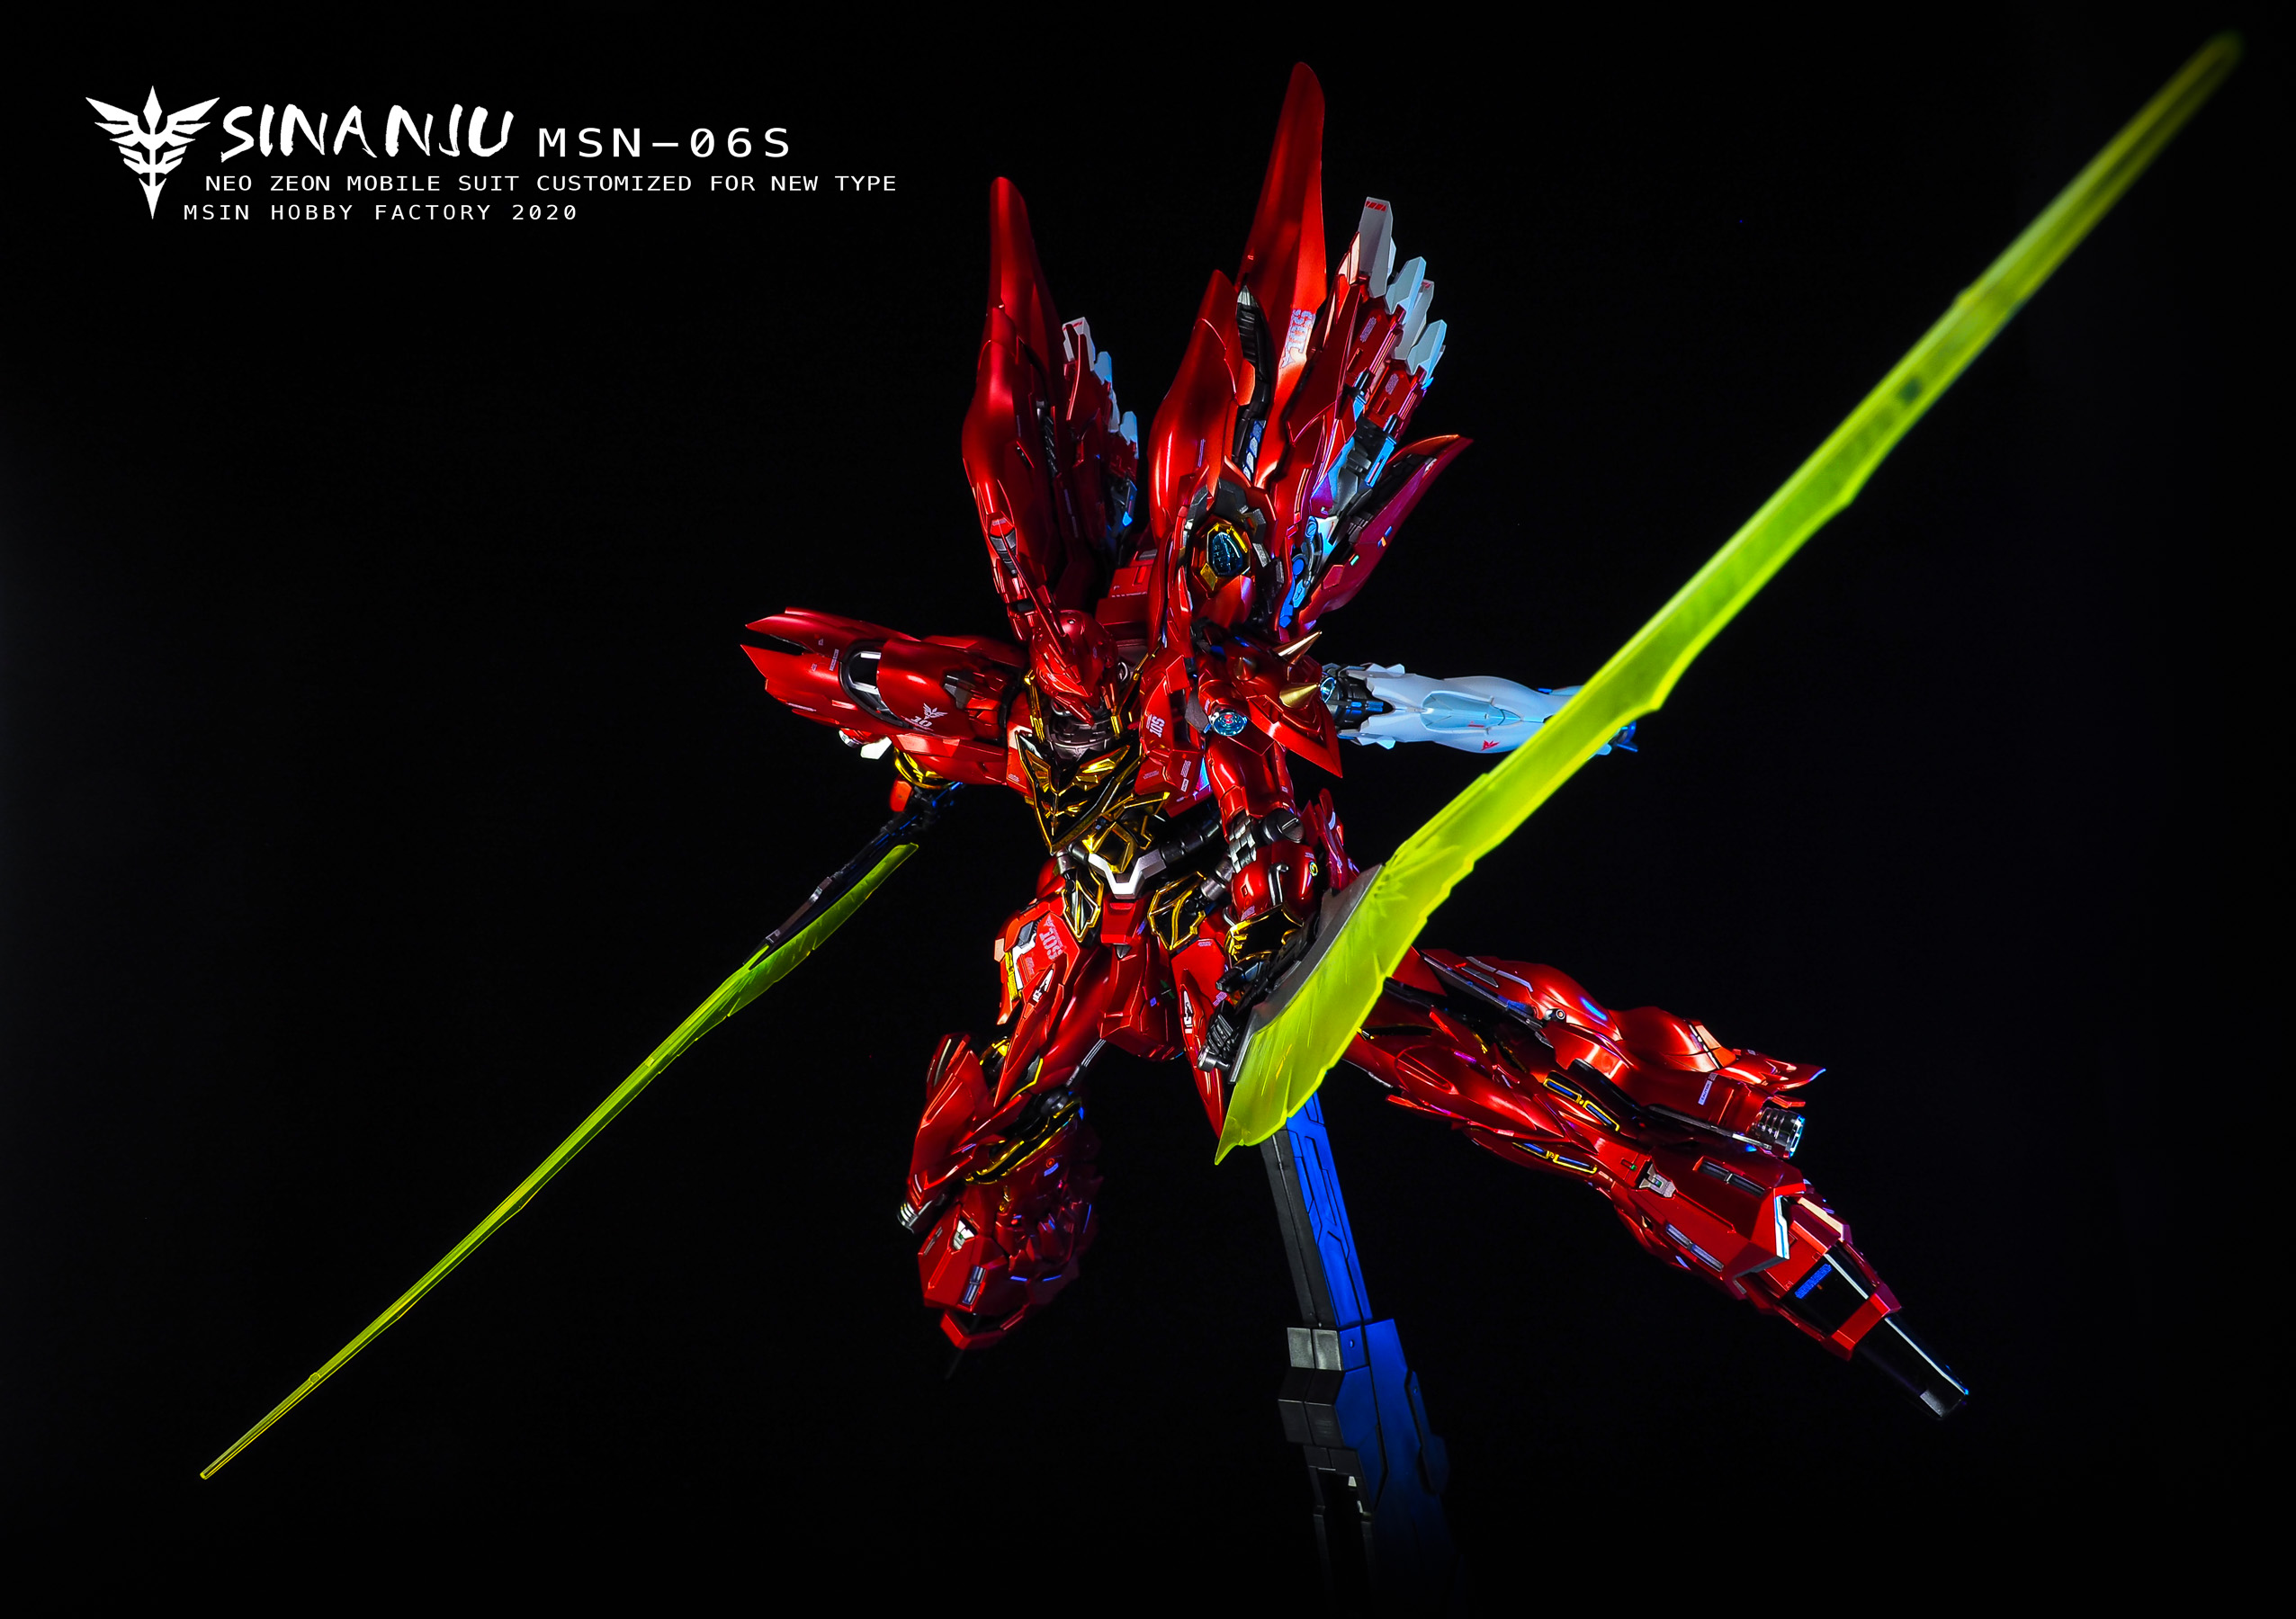 S437_6_takumi_sinanju_red_018.jpg